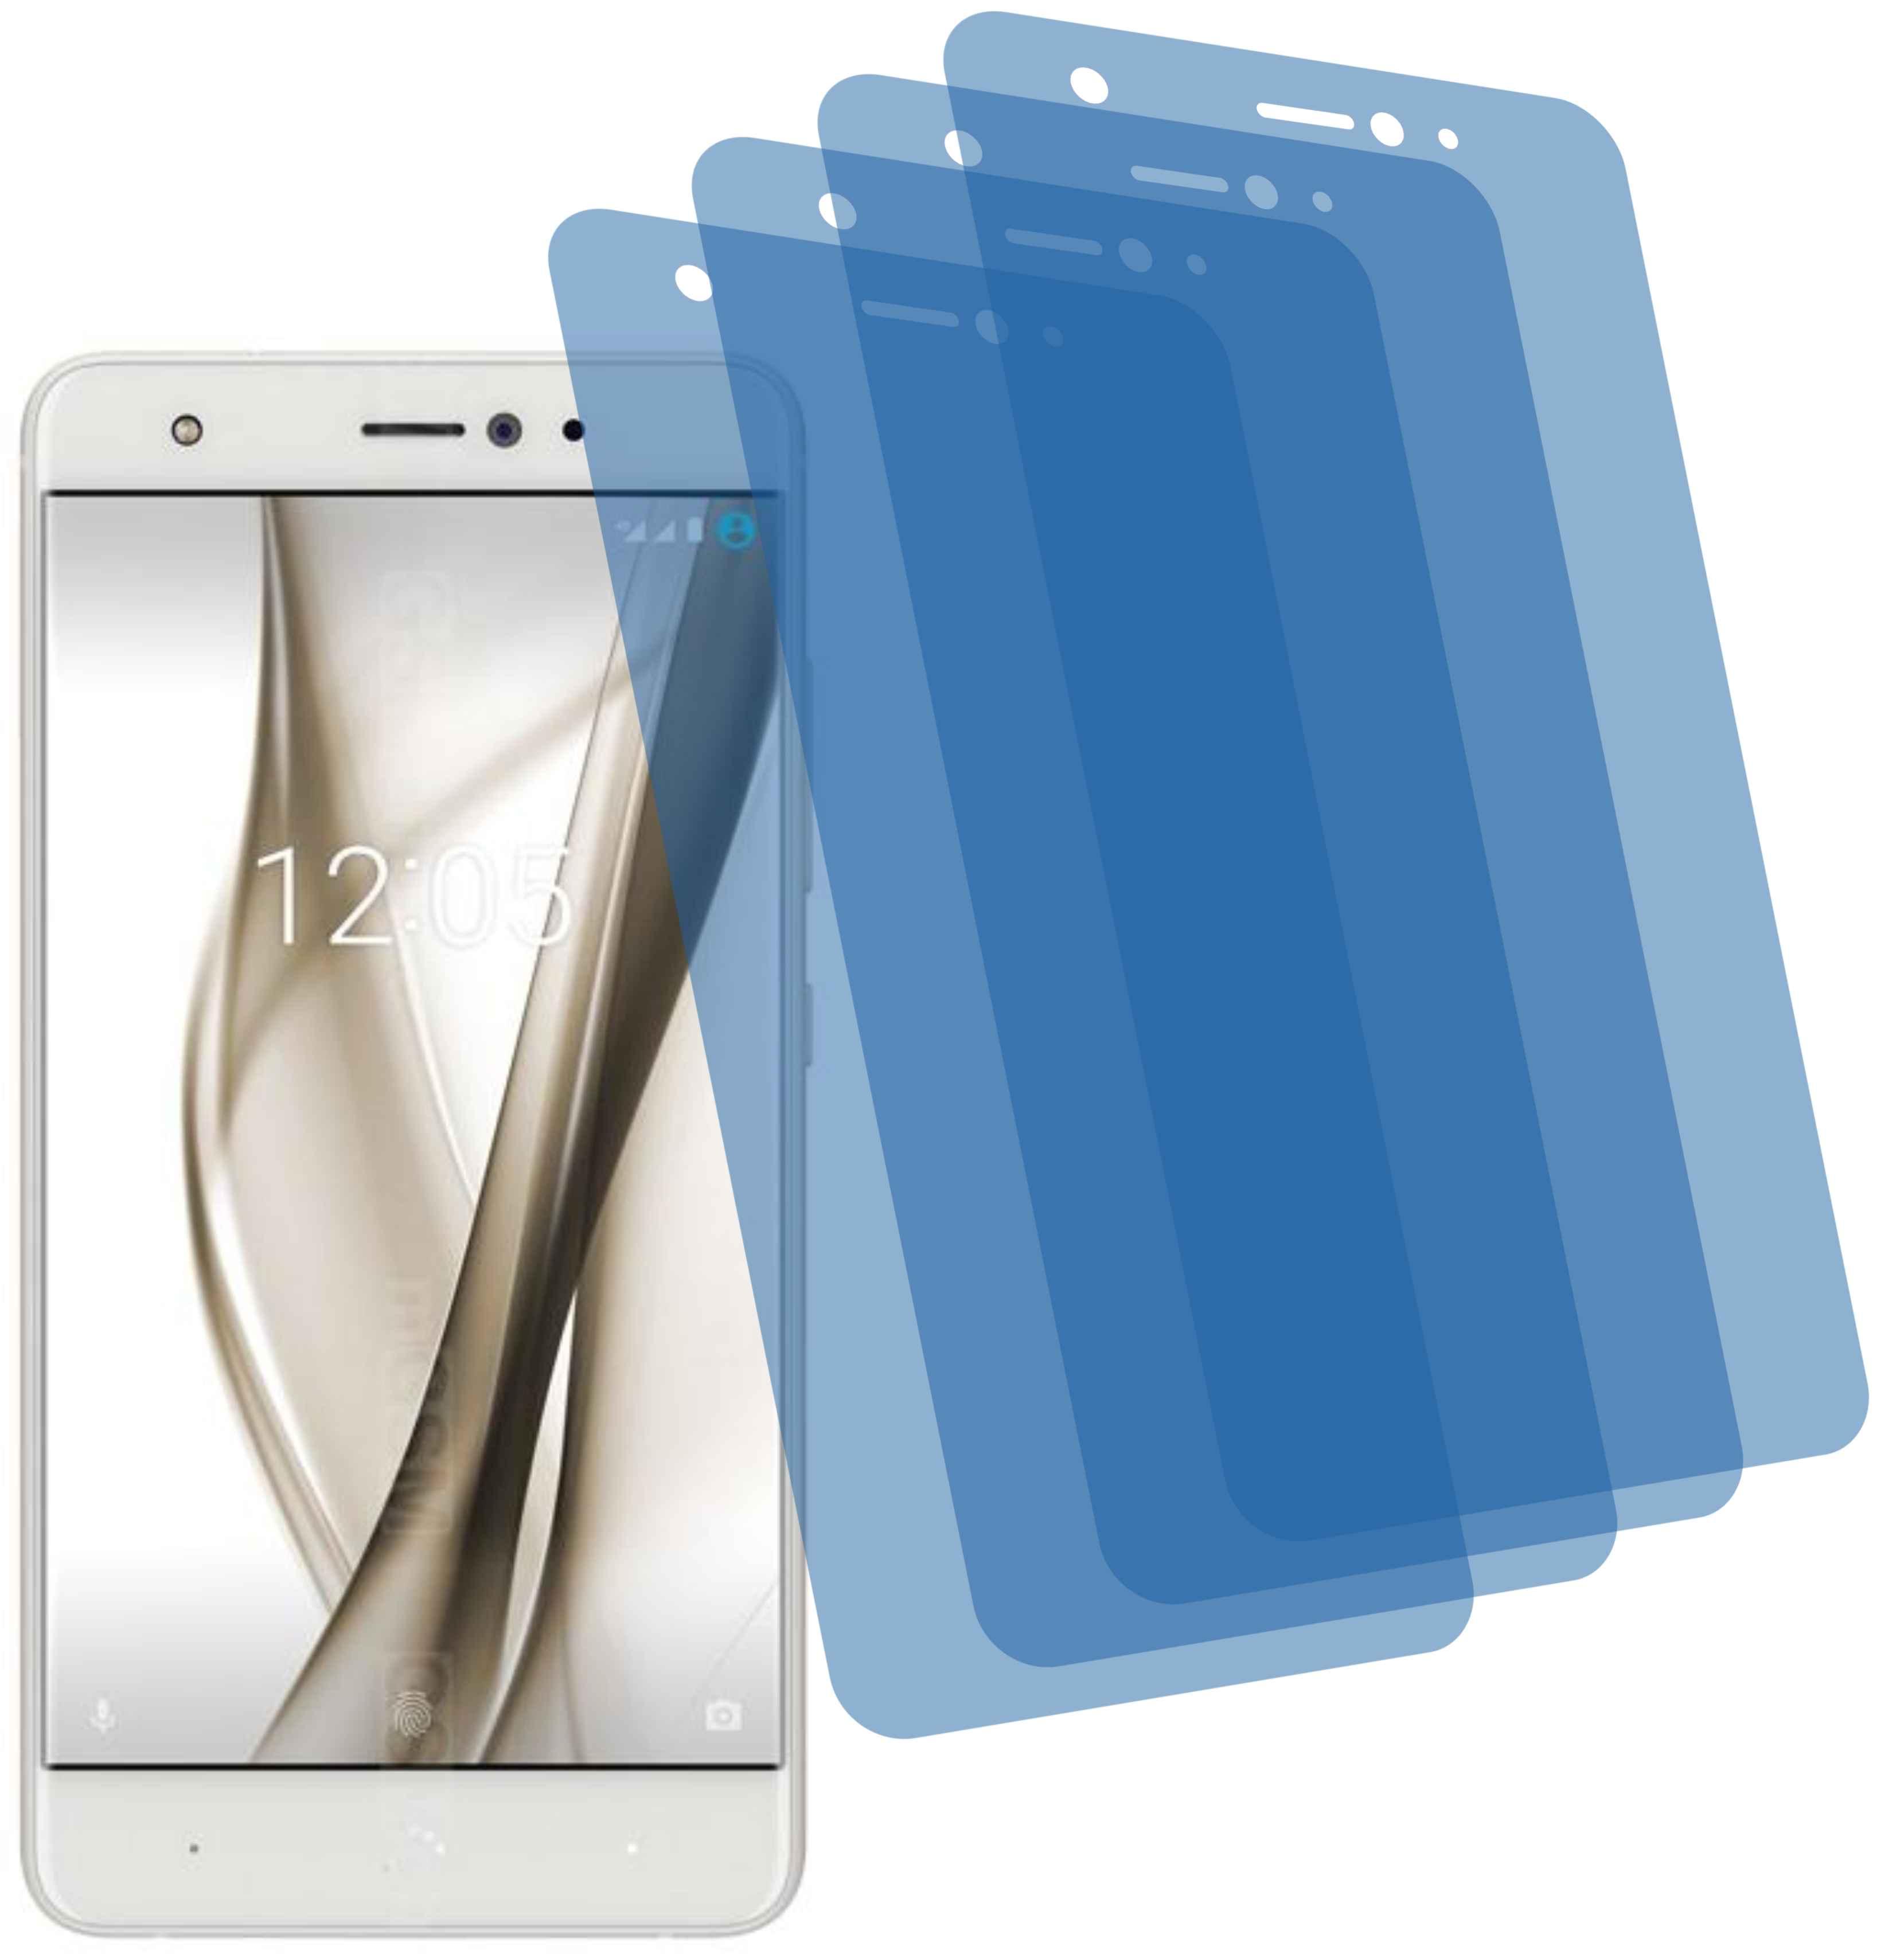 4x Displayschutzfolie antireflex für bq Aquaris X Pro